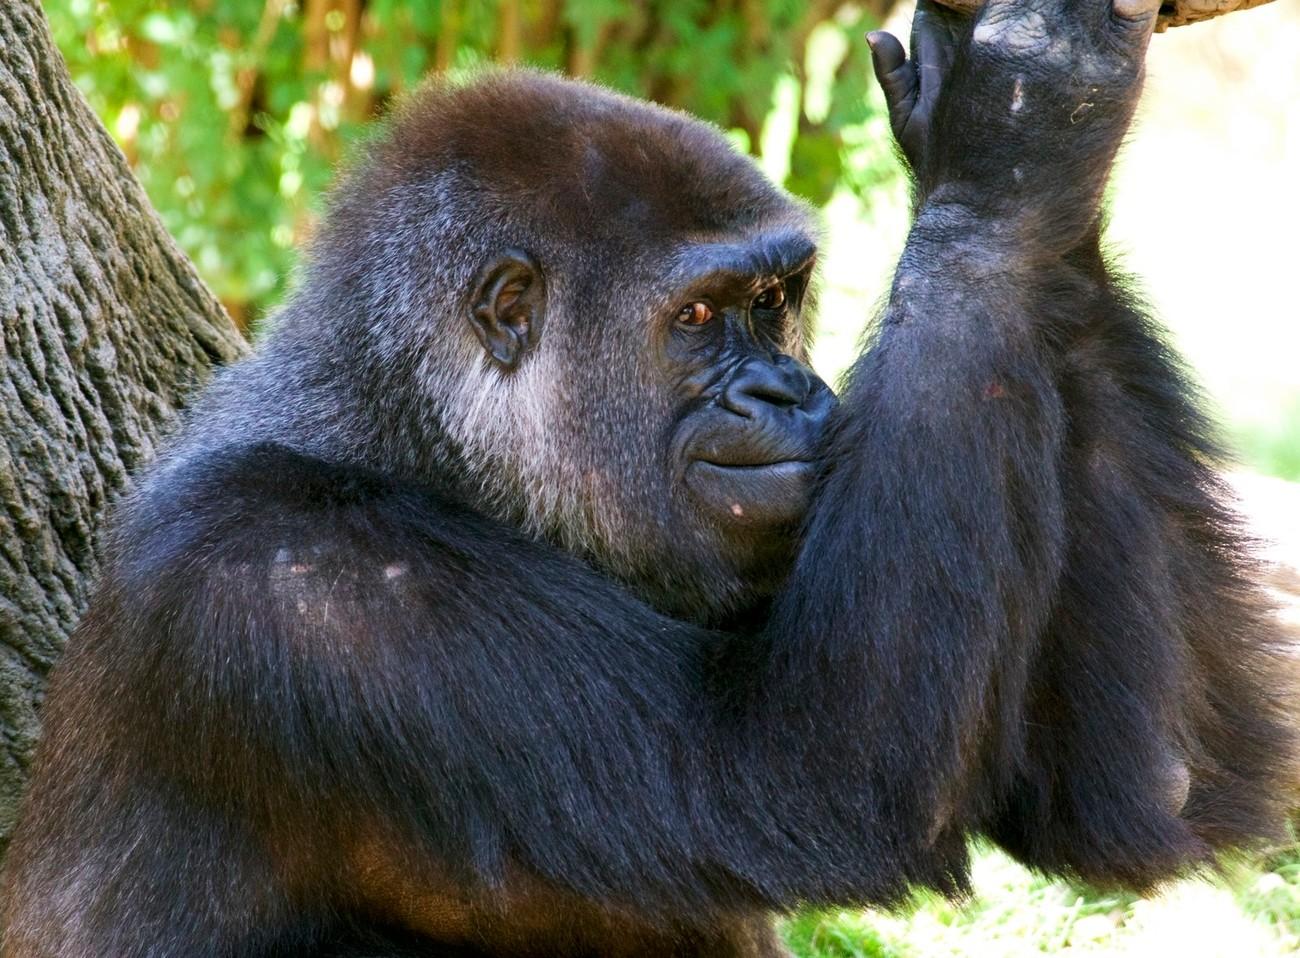 Mara the female Western Lowland Gorilla has serious attitude